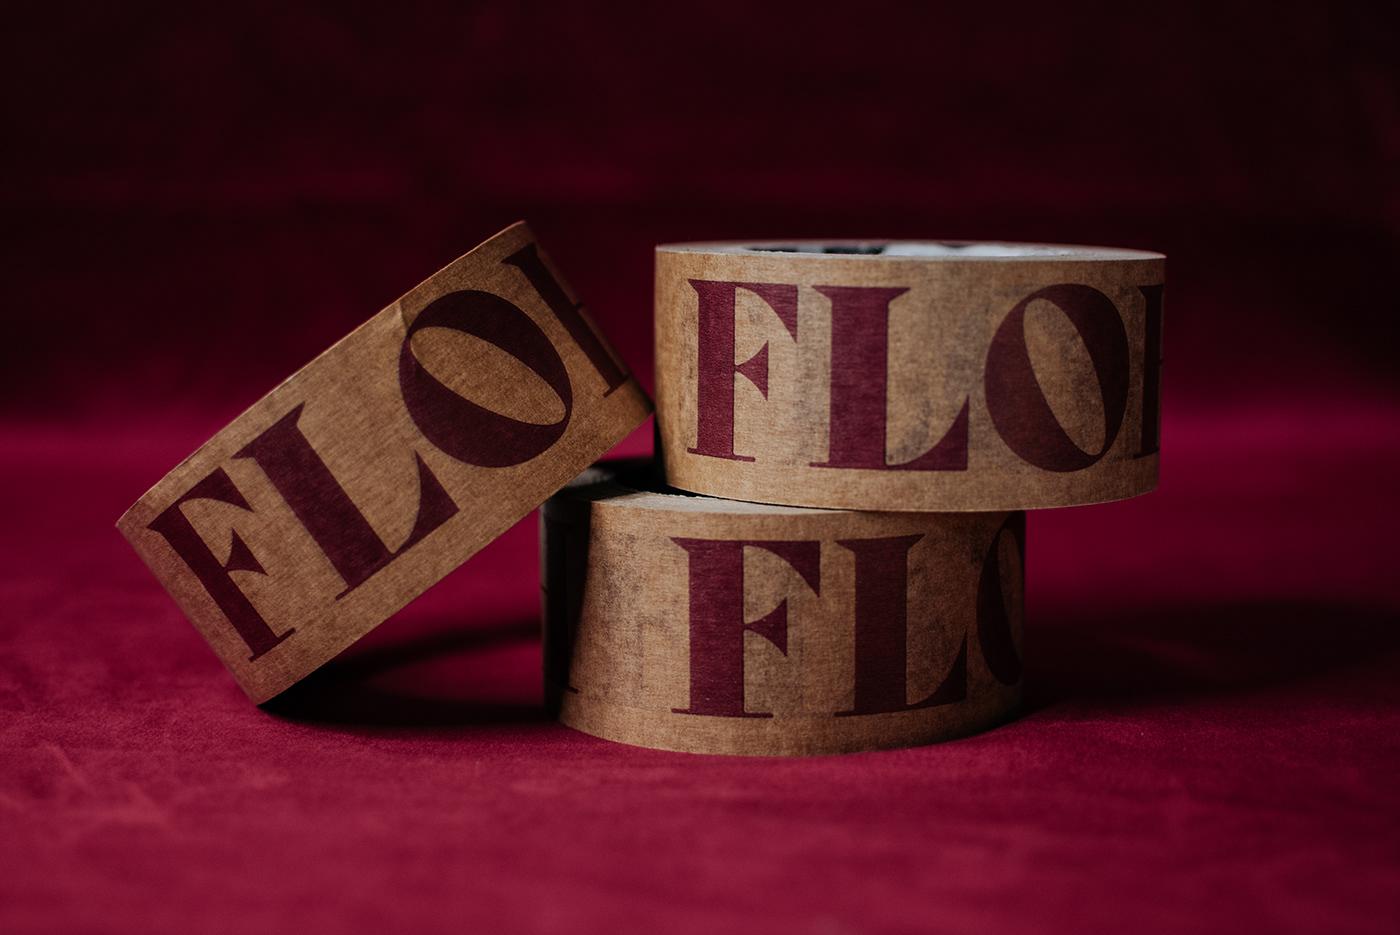 Floh scotch tape